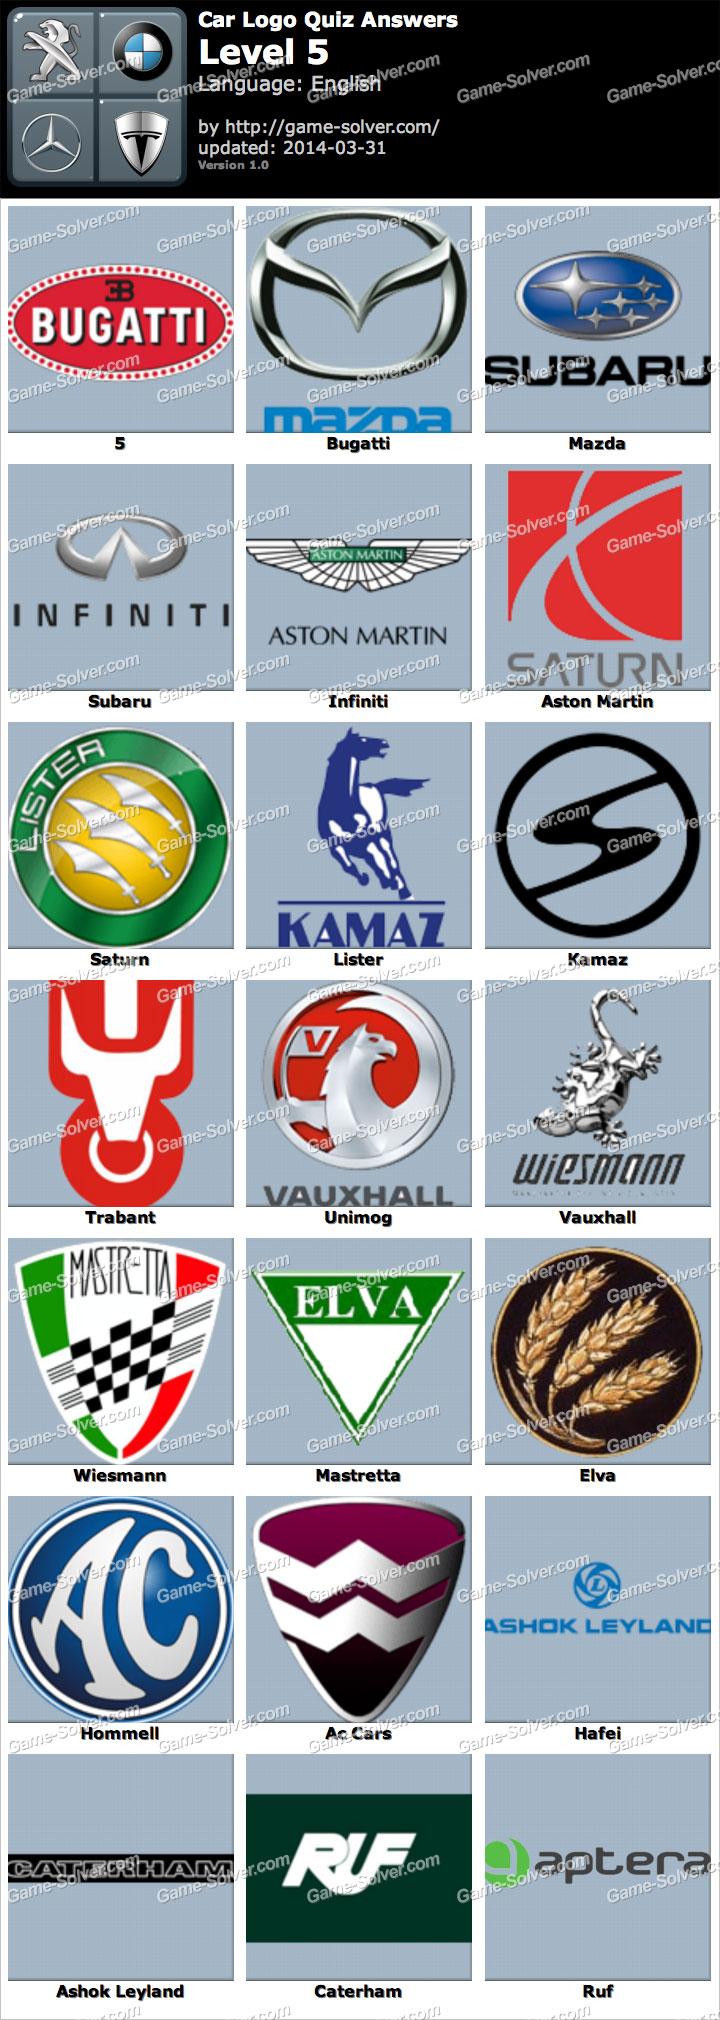 car logo quiz answers | Wordcars co